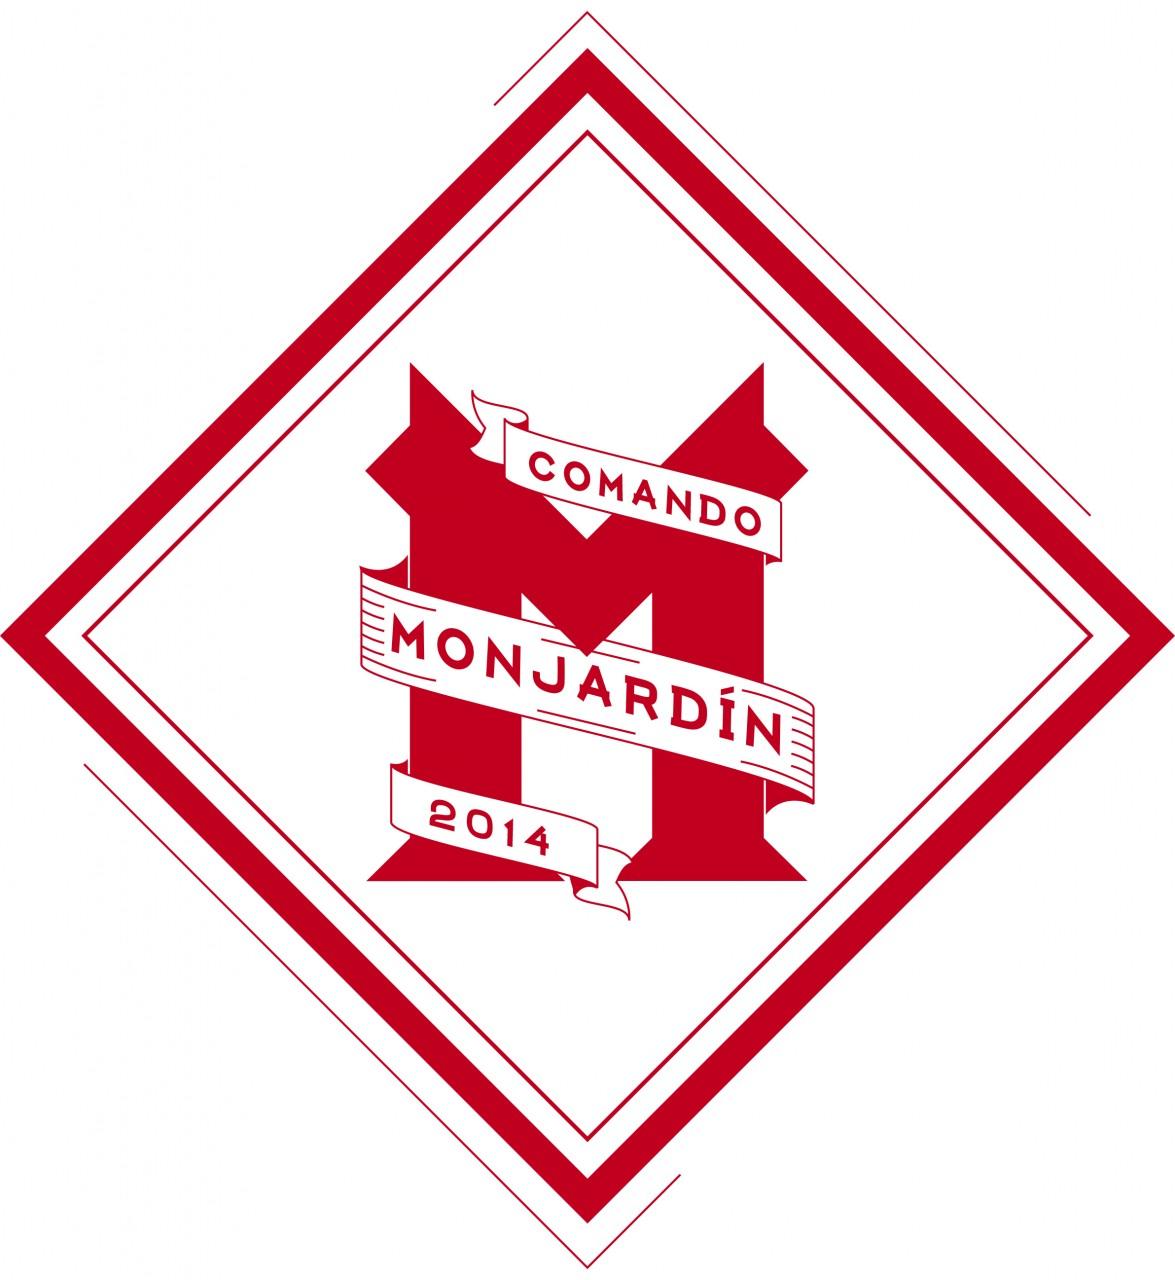 Monjardin_ROJA_OK